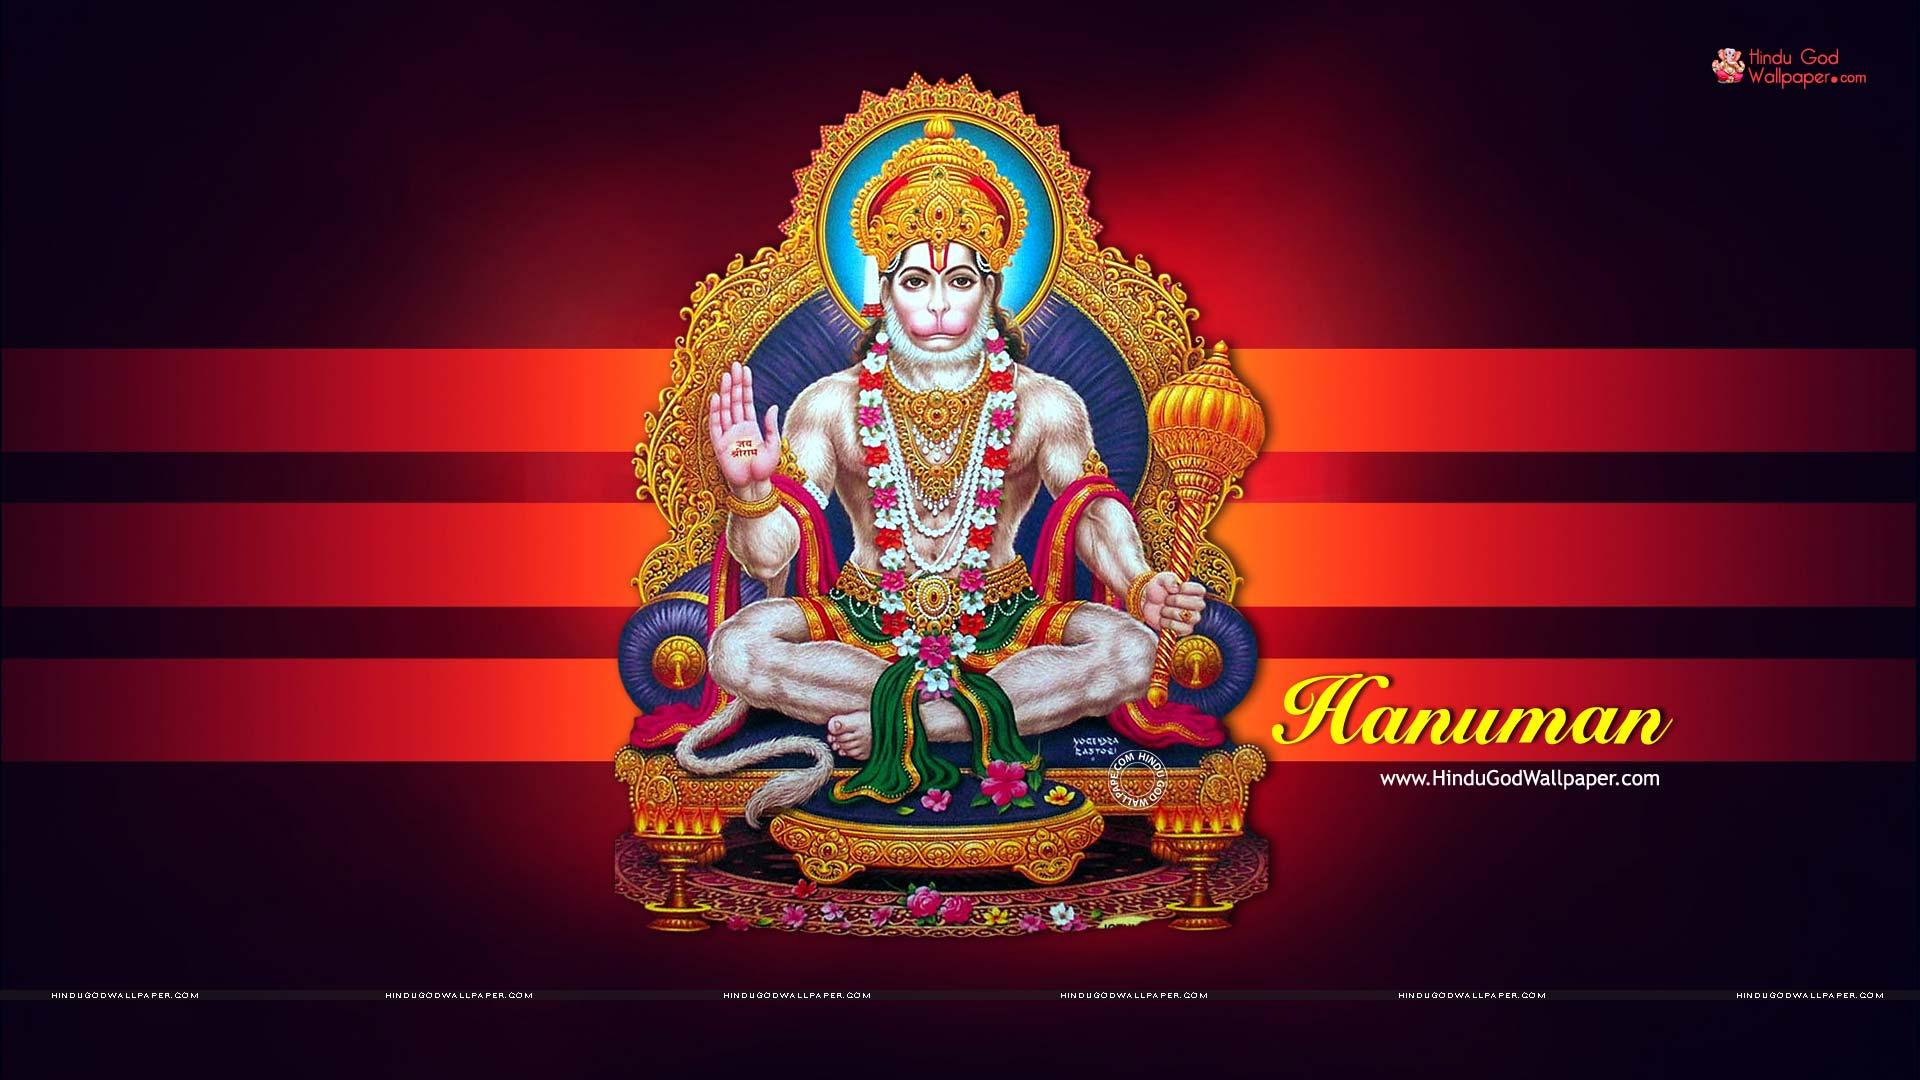 Hanuman Hd Wallpaper Full Size